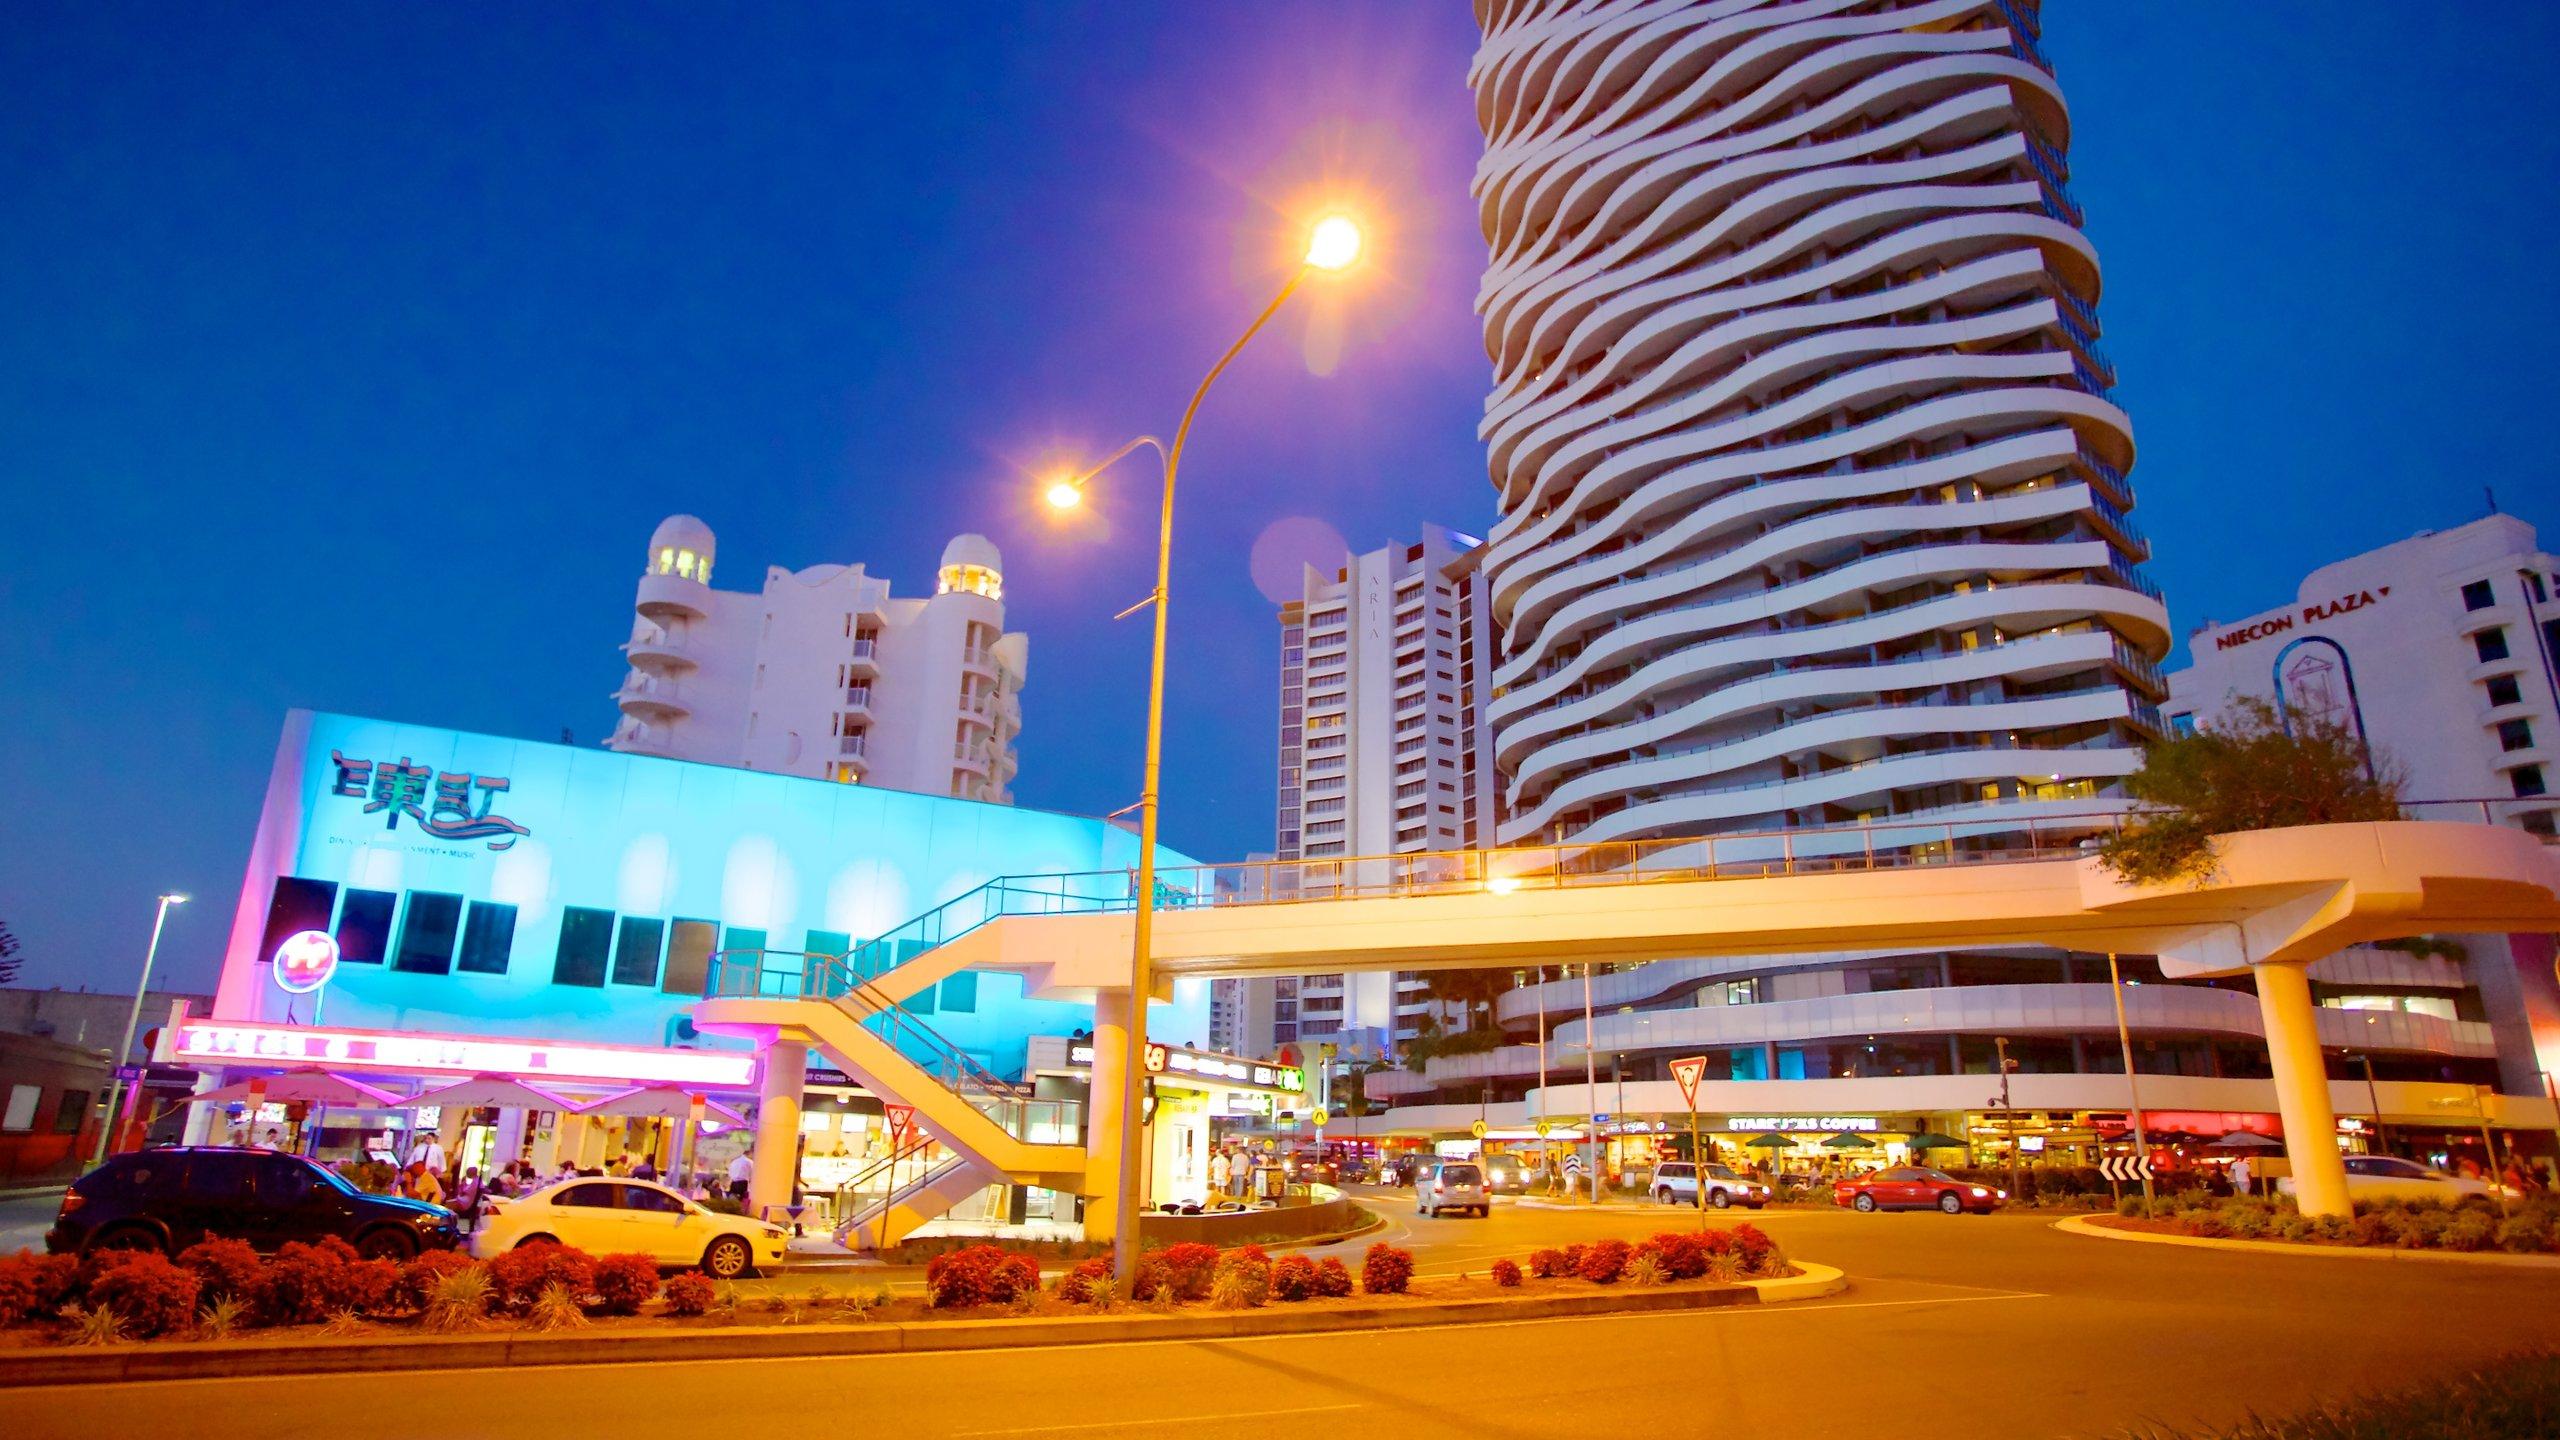 Gold Coast City, Queensland, Australia